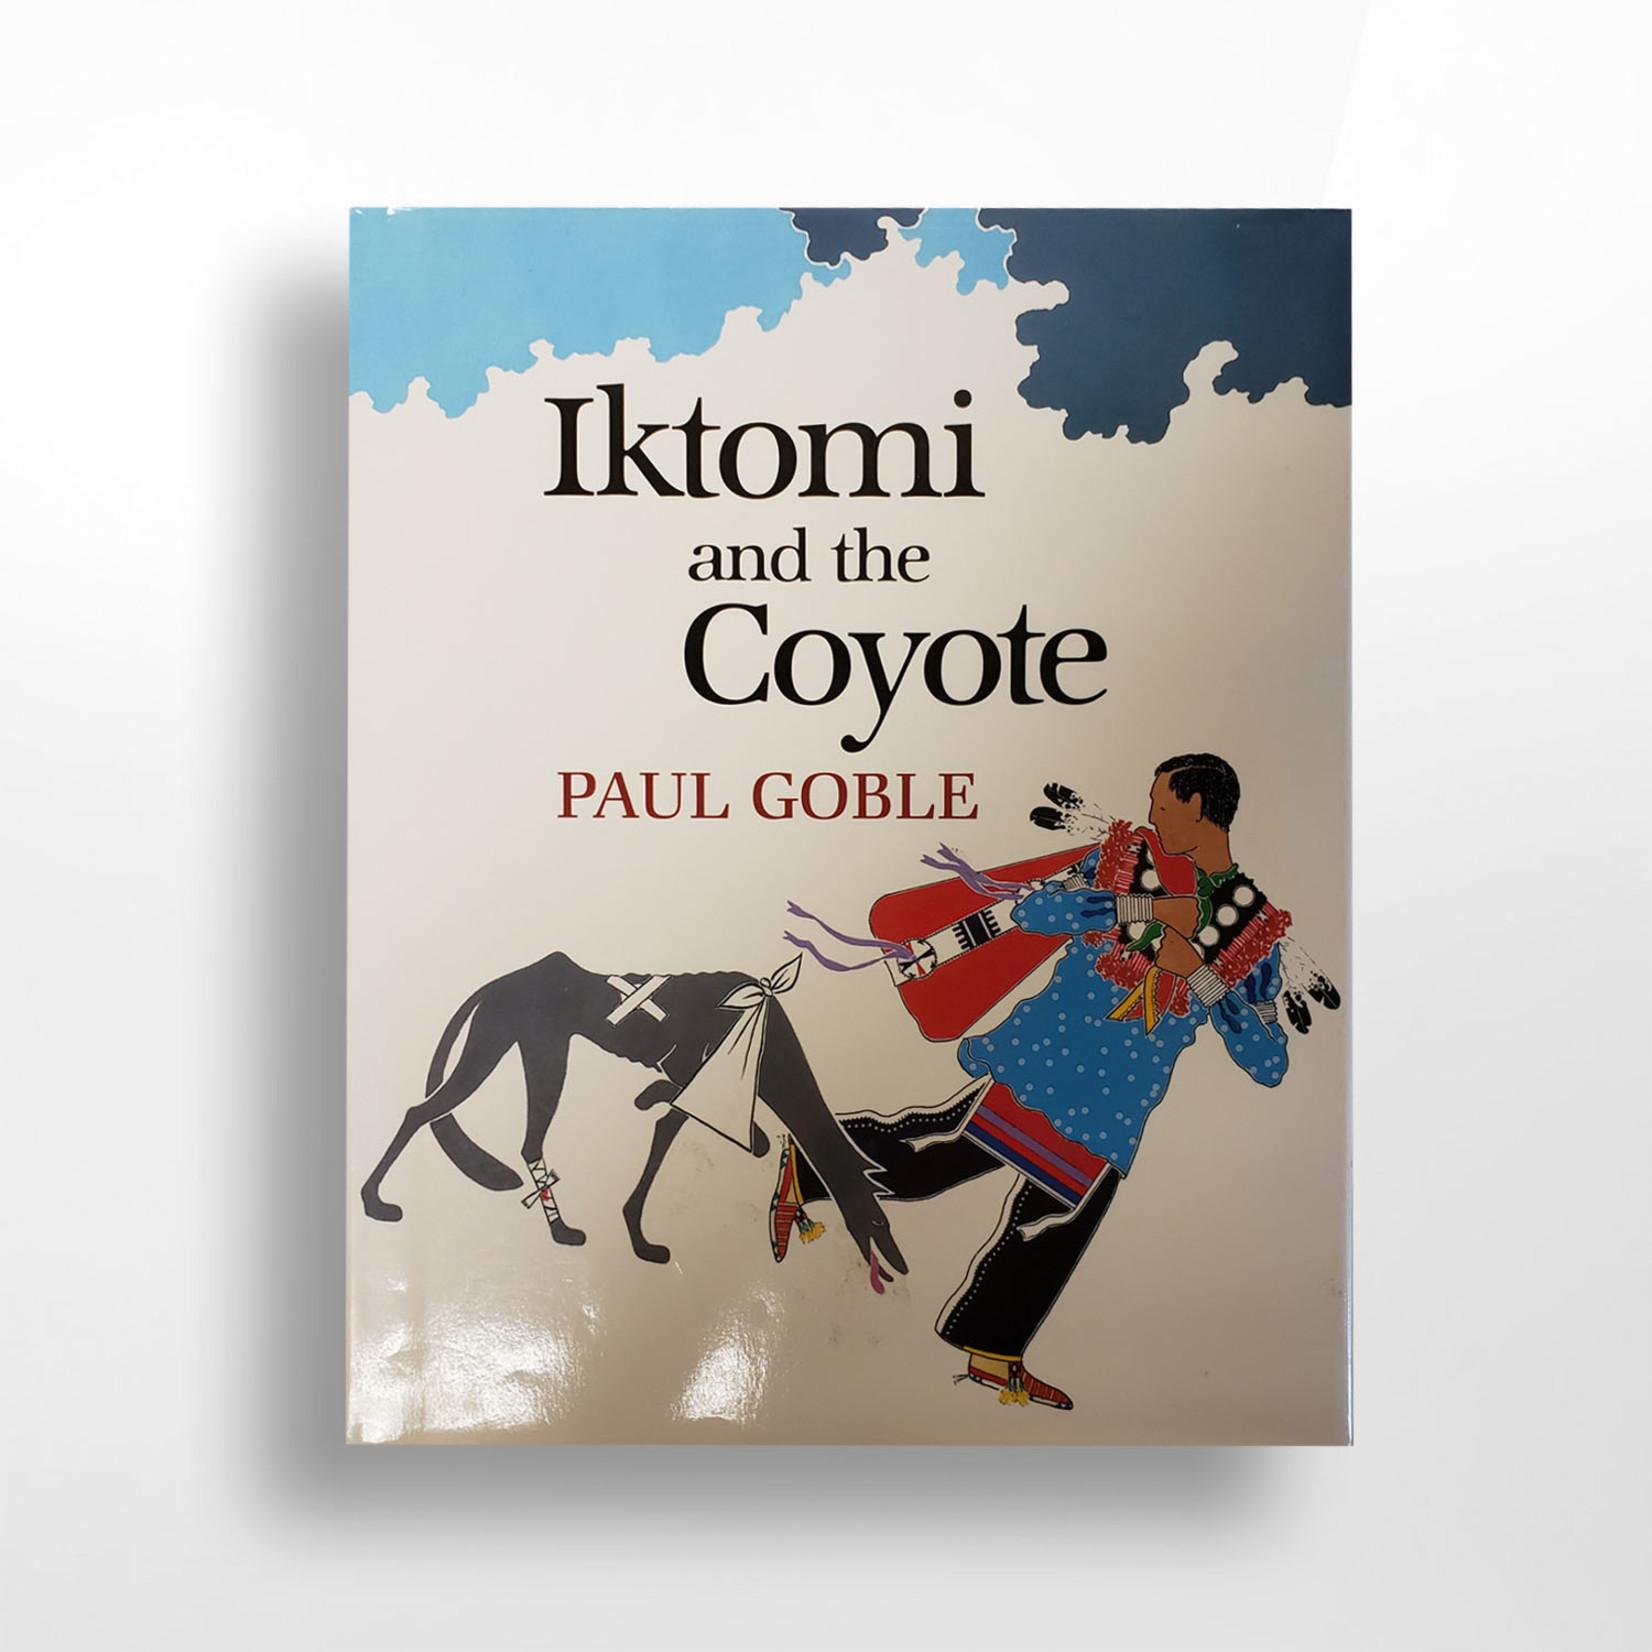 Dakota West Books Iktomi and the Coyote